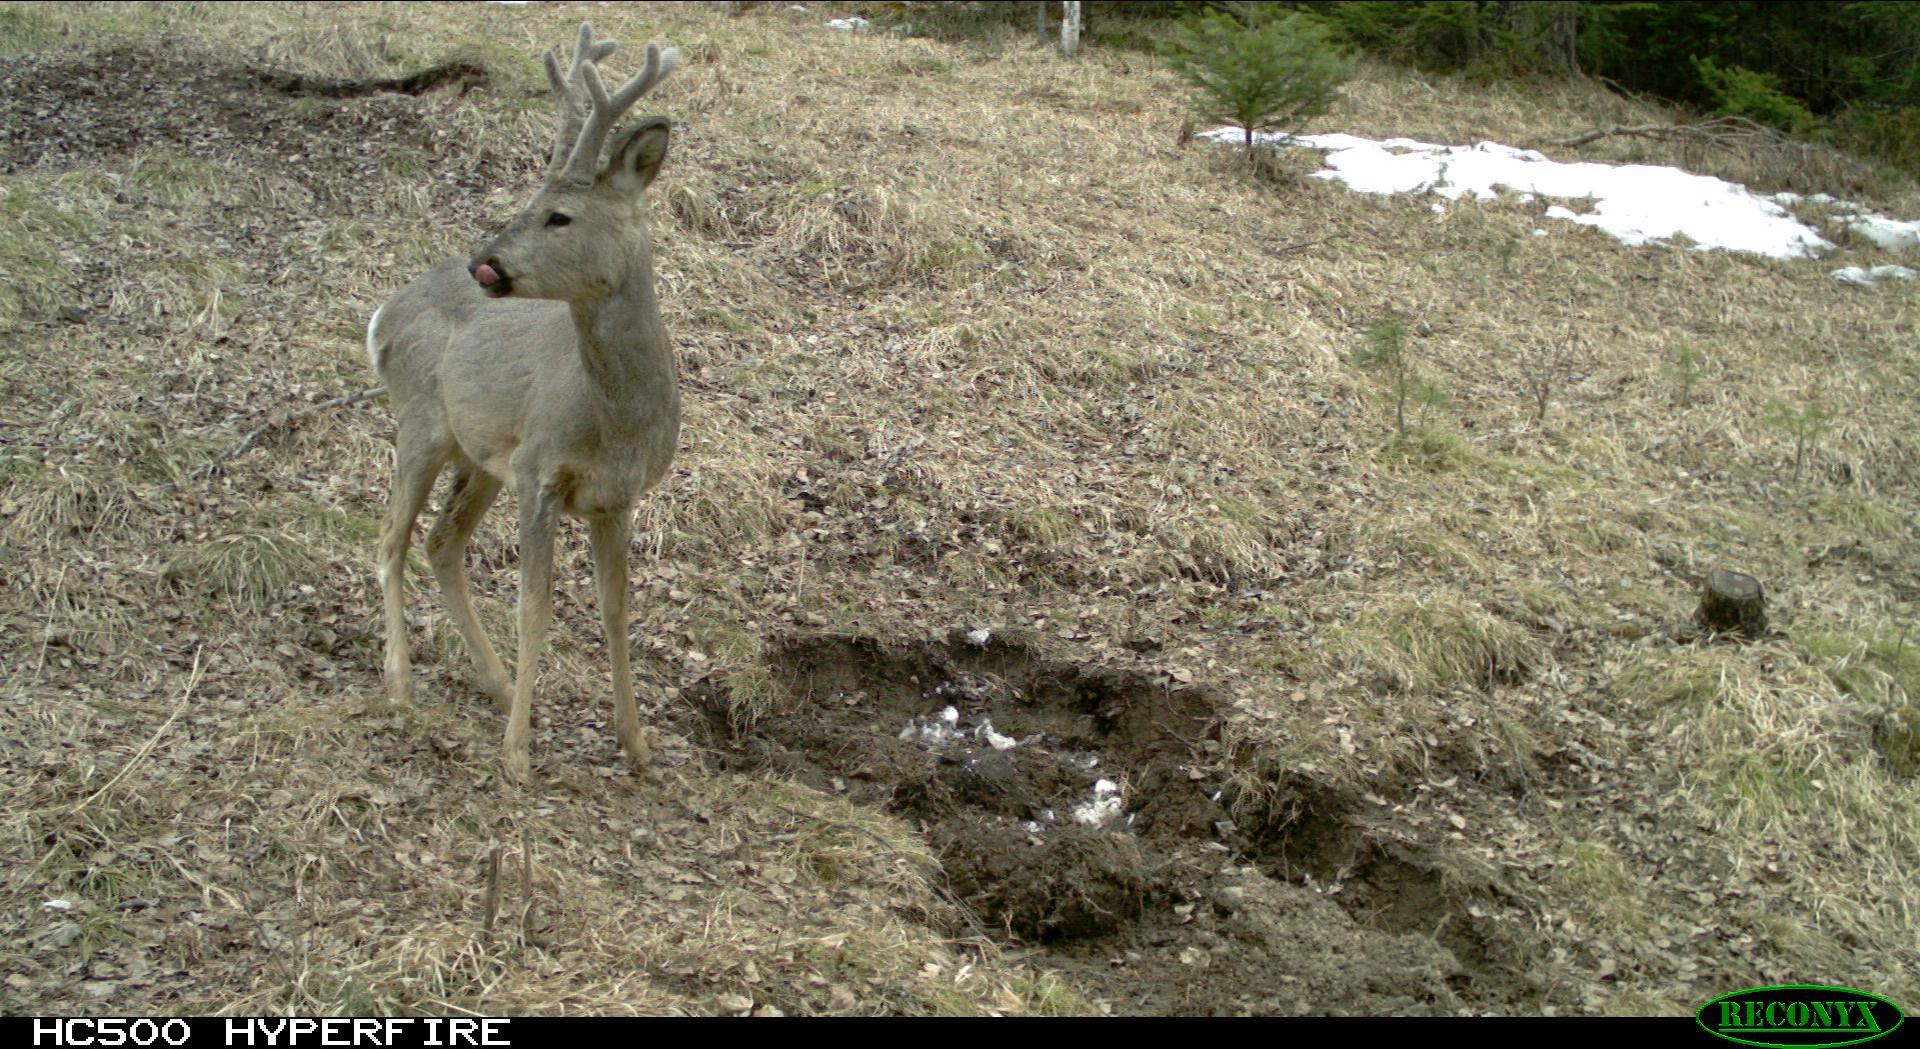 Siberian Roe Deer During The Rut In 2021 with regard to Deer Rut Calendar 2021